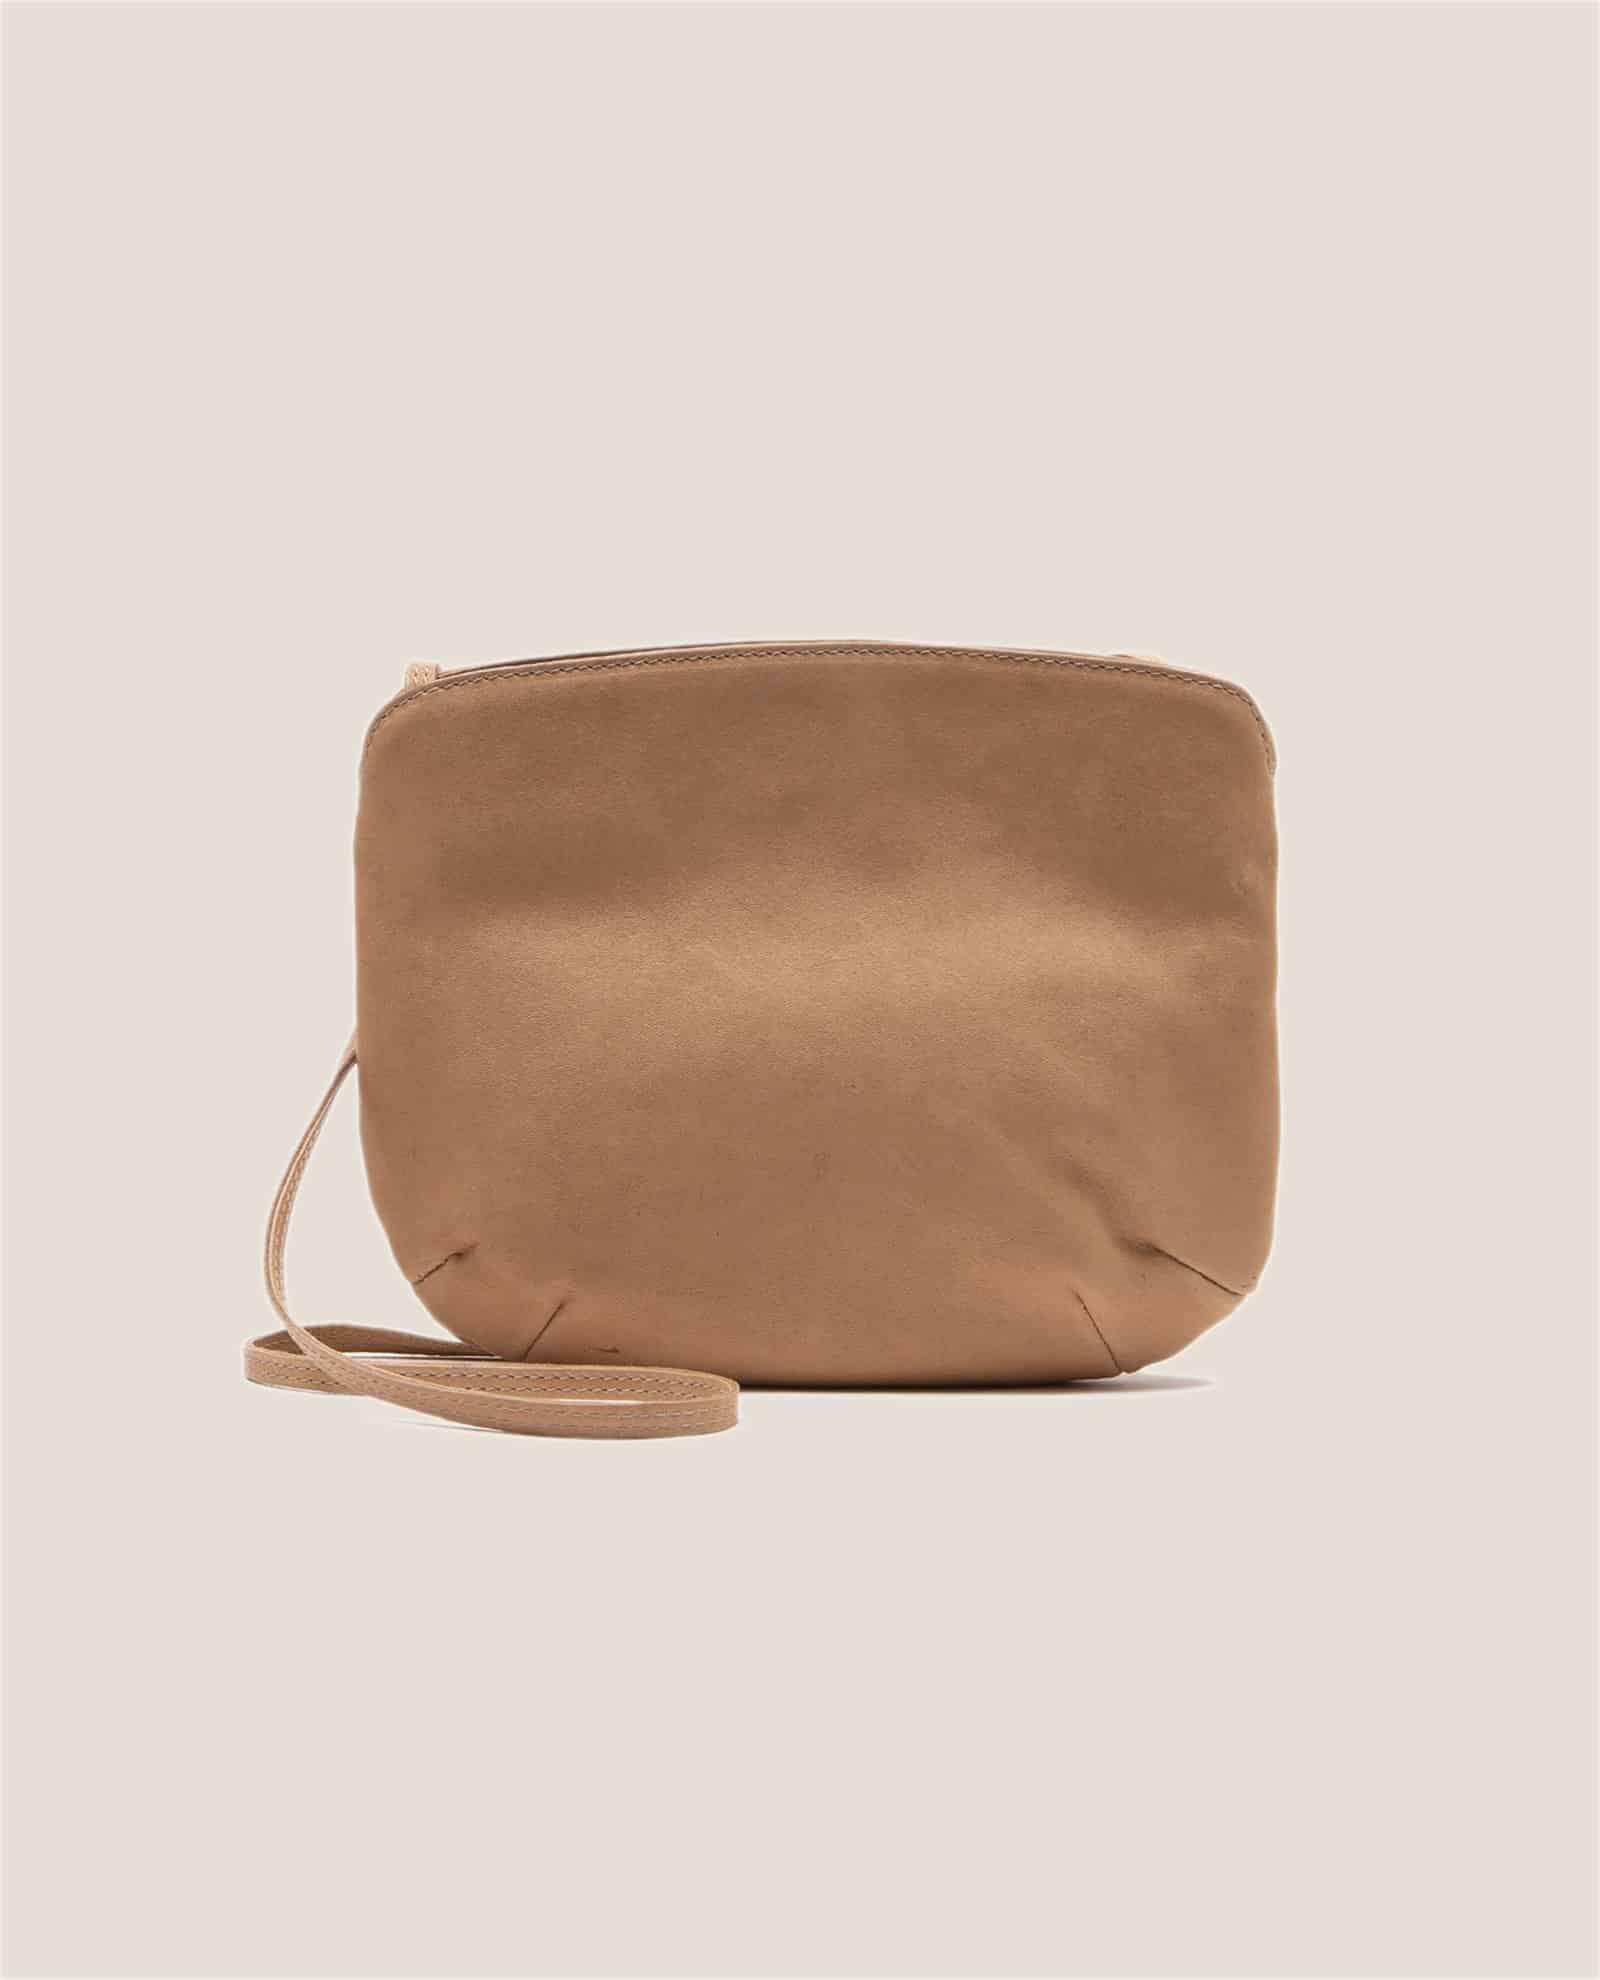 Cross Body Bag, Debbie pink (ref #DPR-16) Petty Things - back